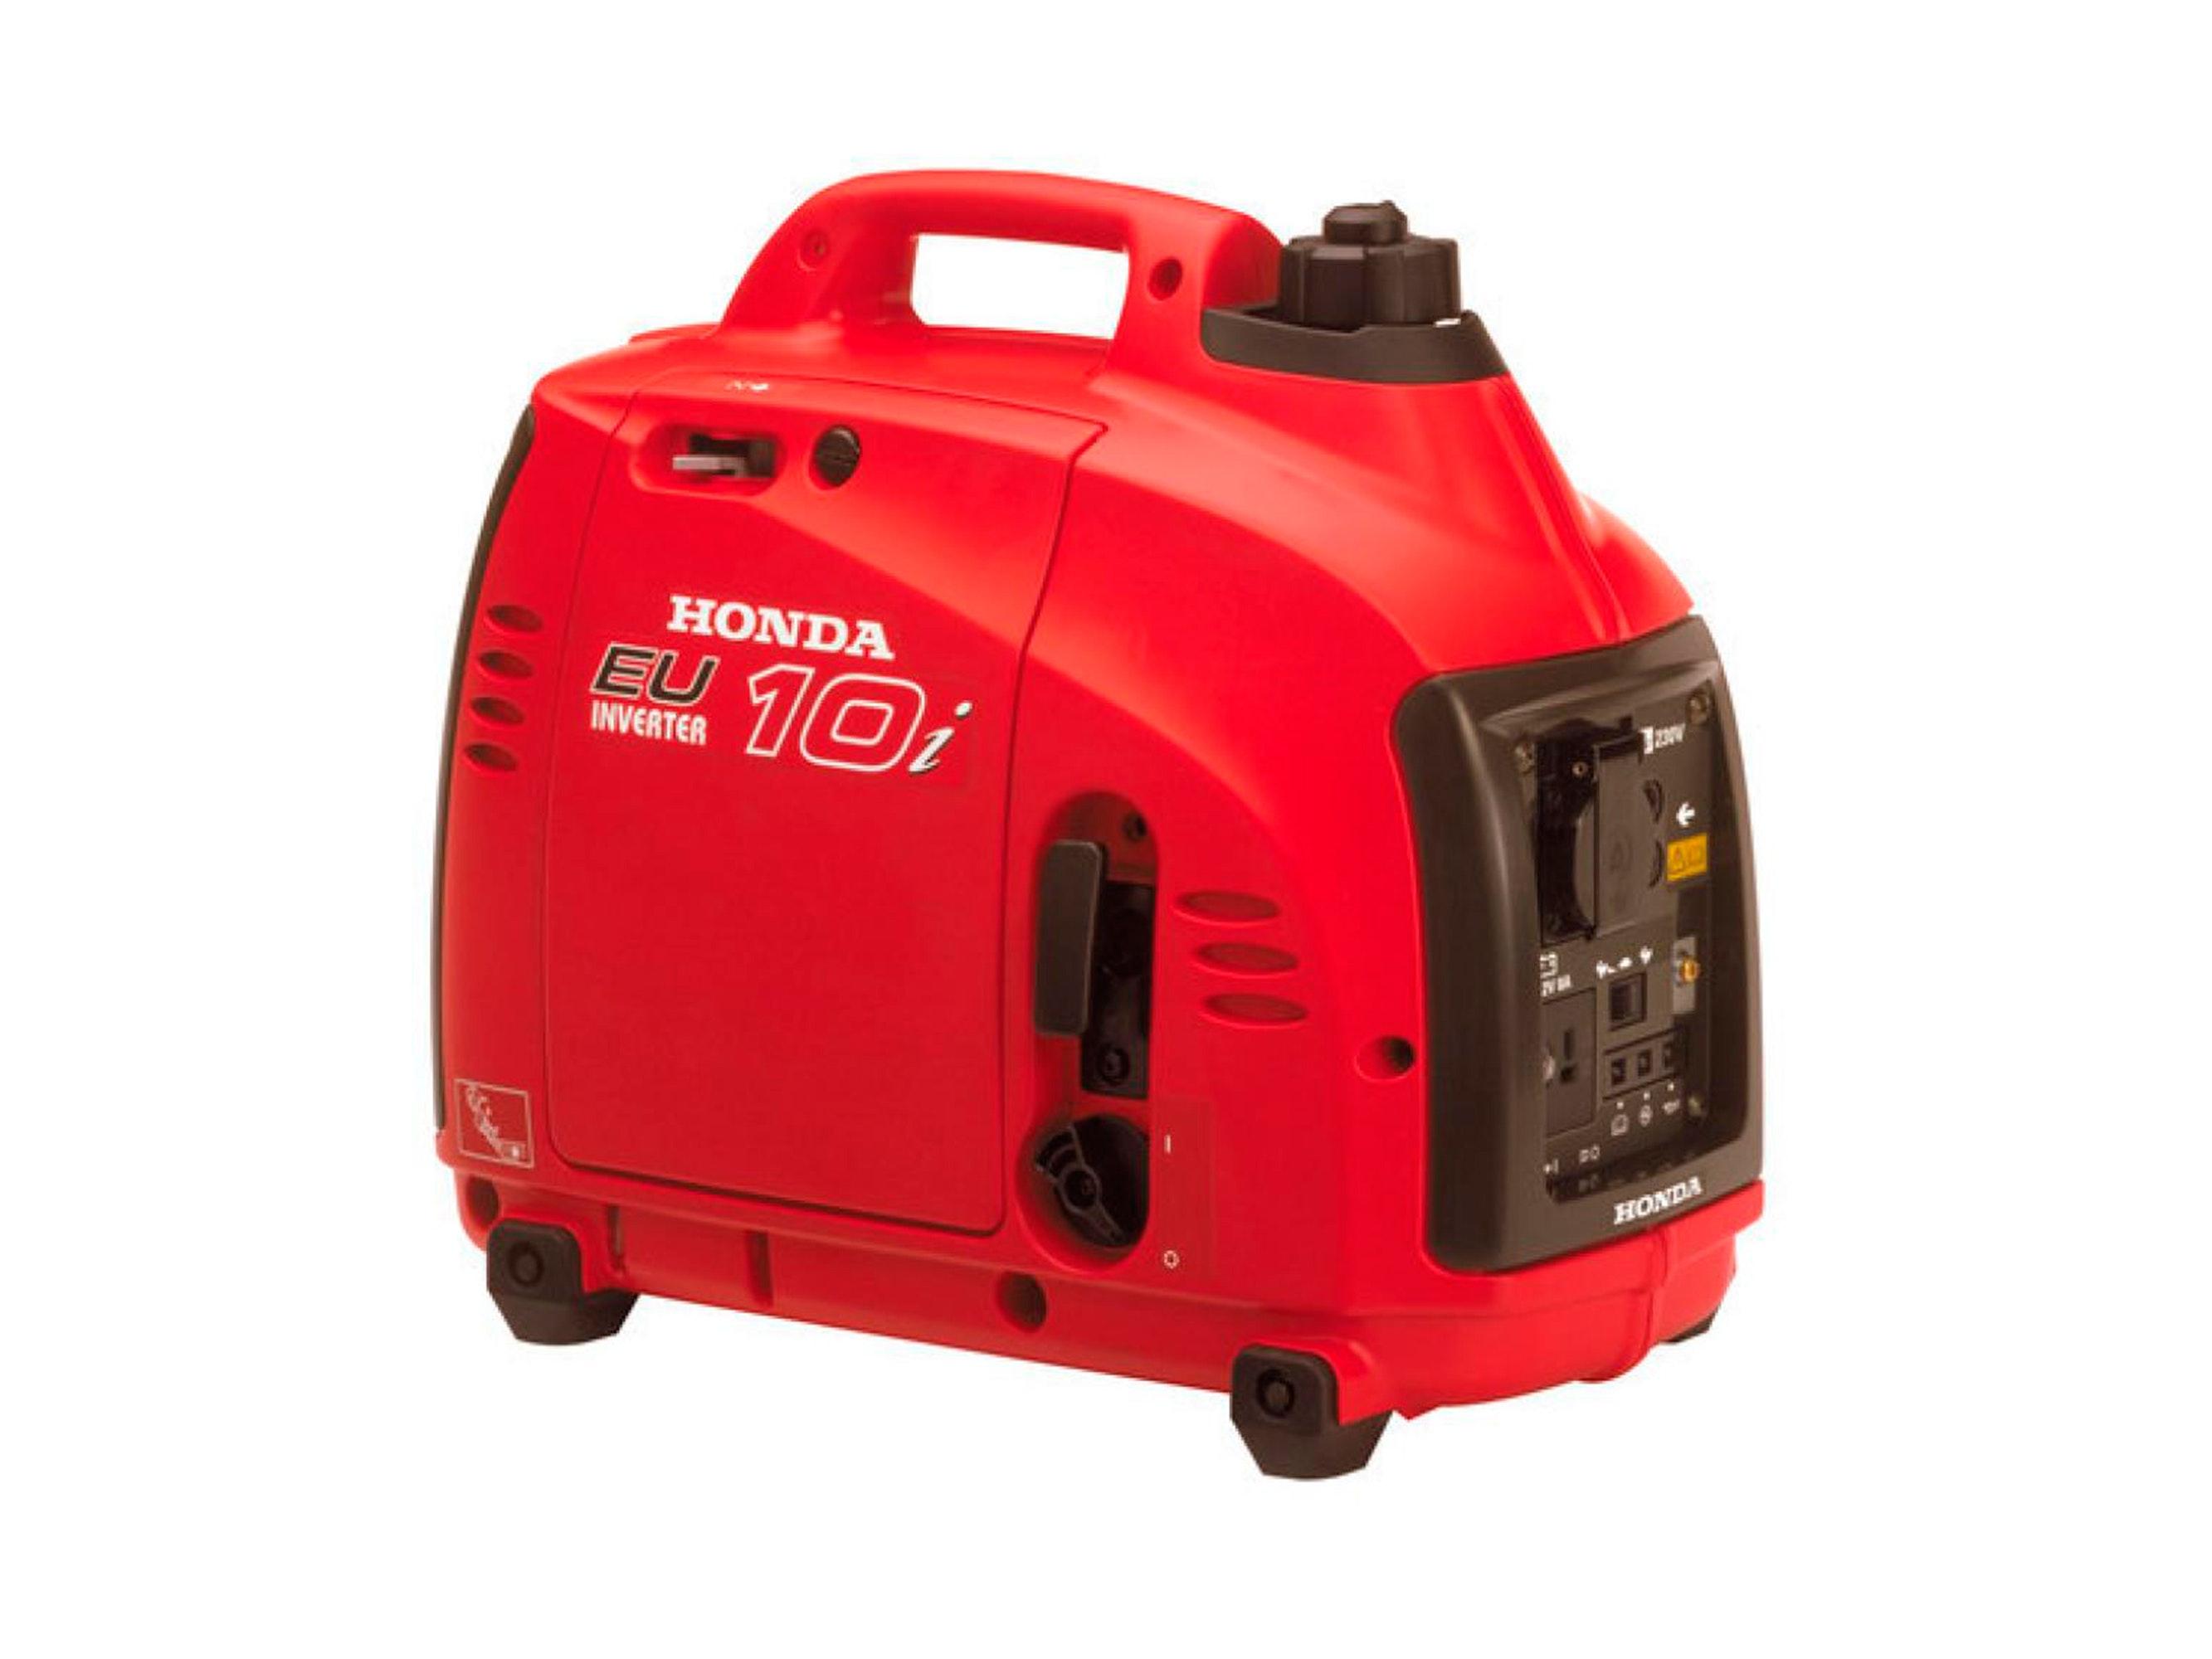 Honda EU10i Inverter Generator 1000W